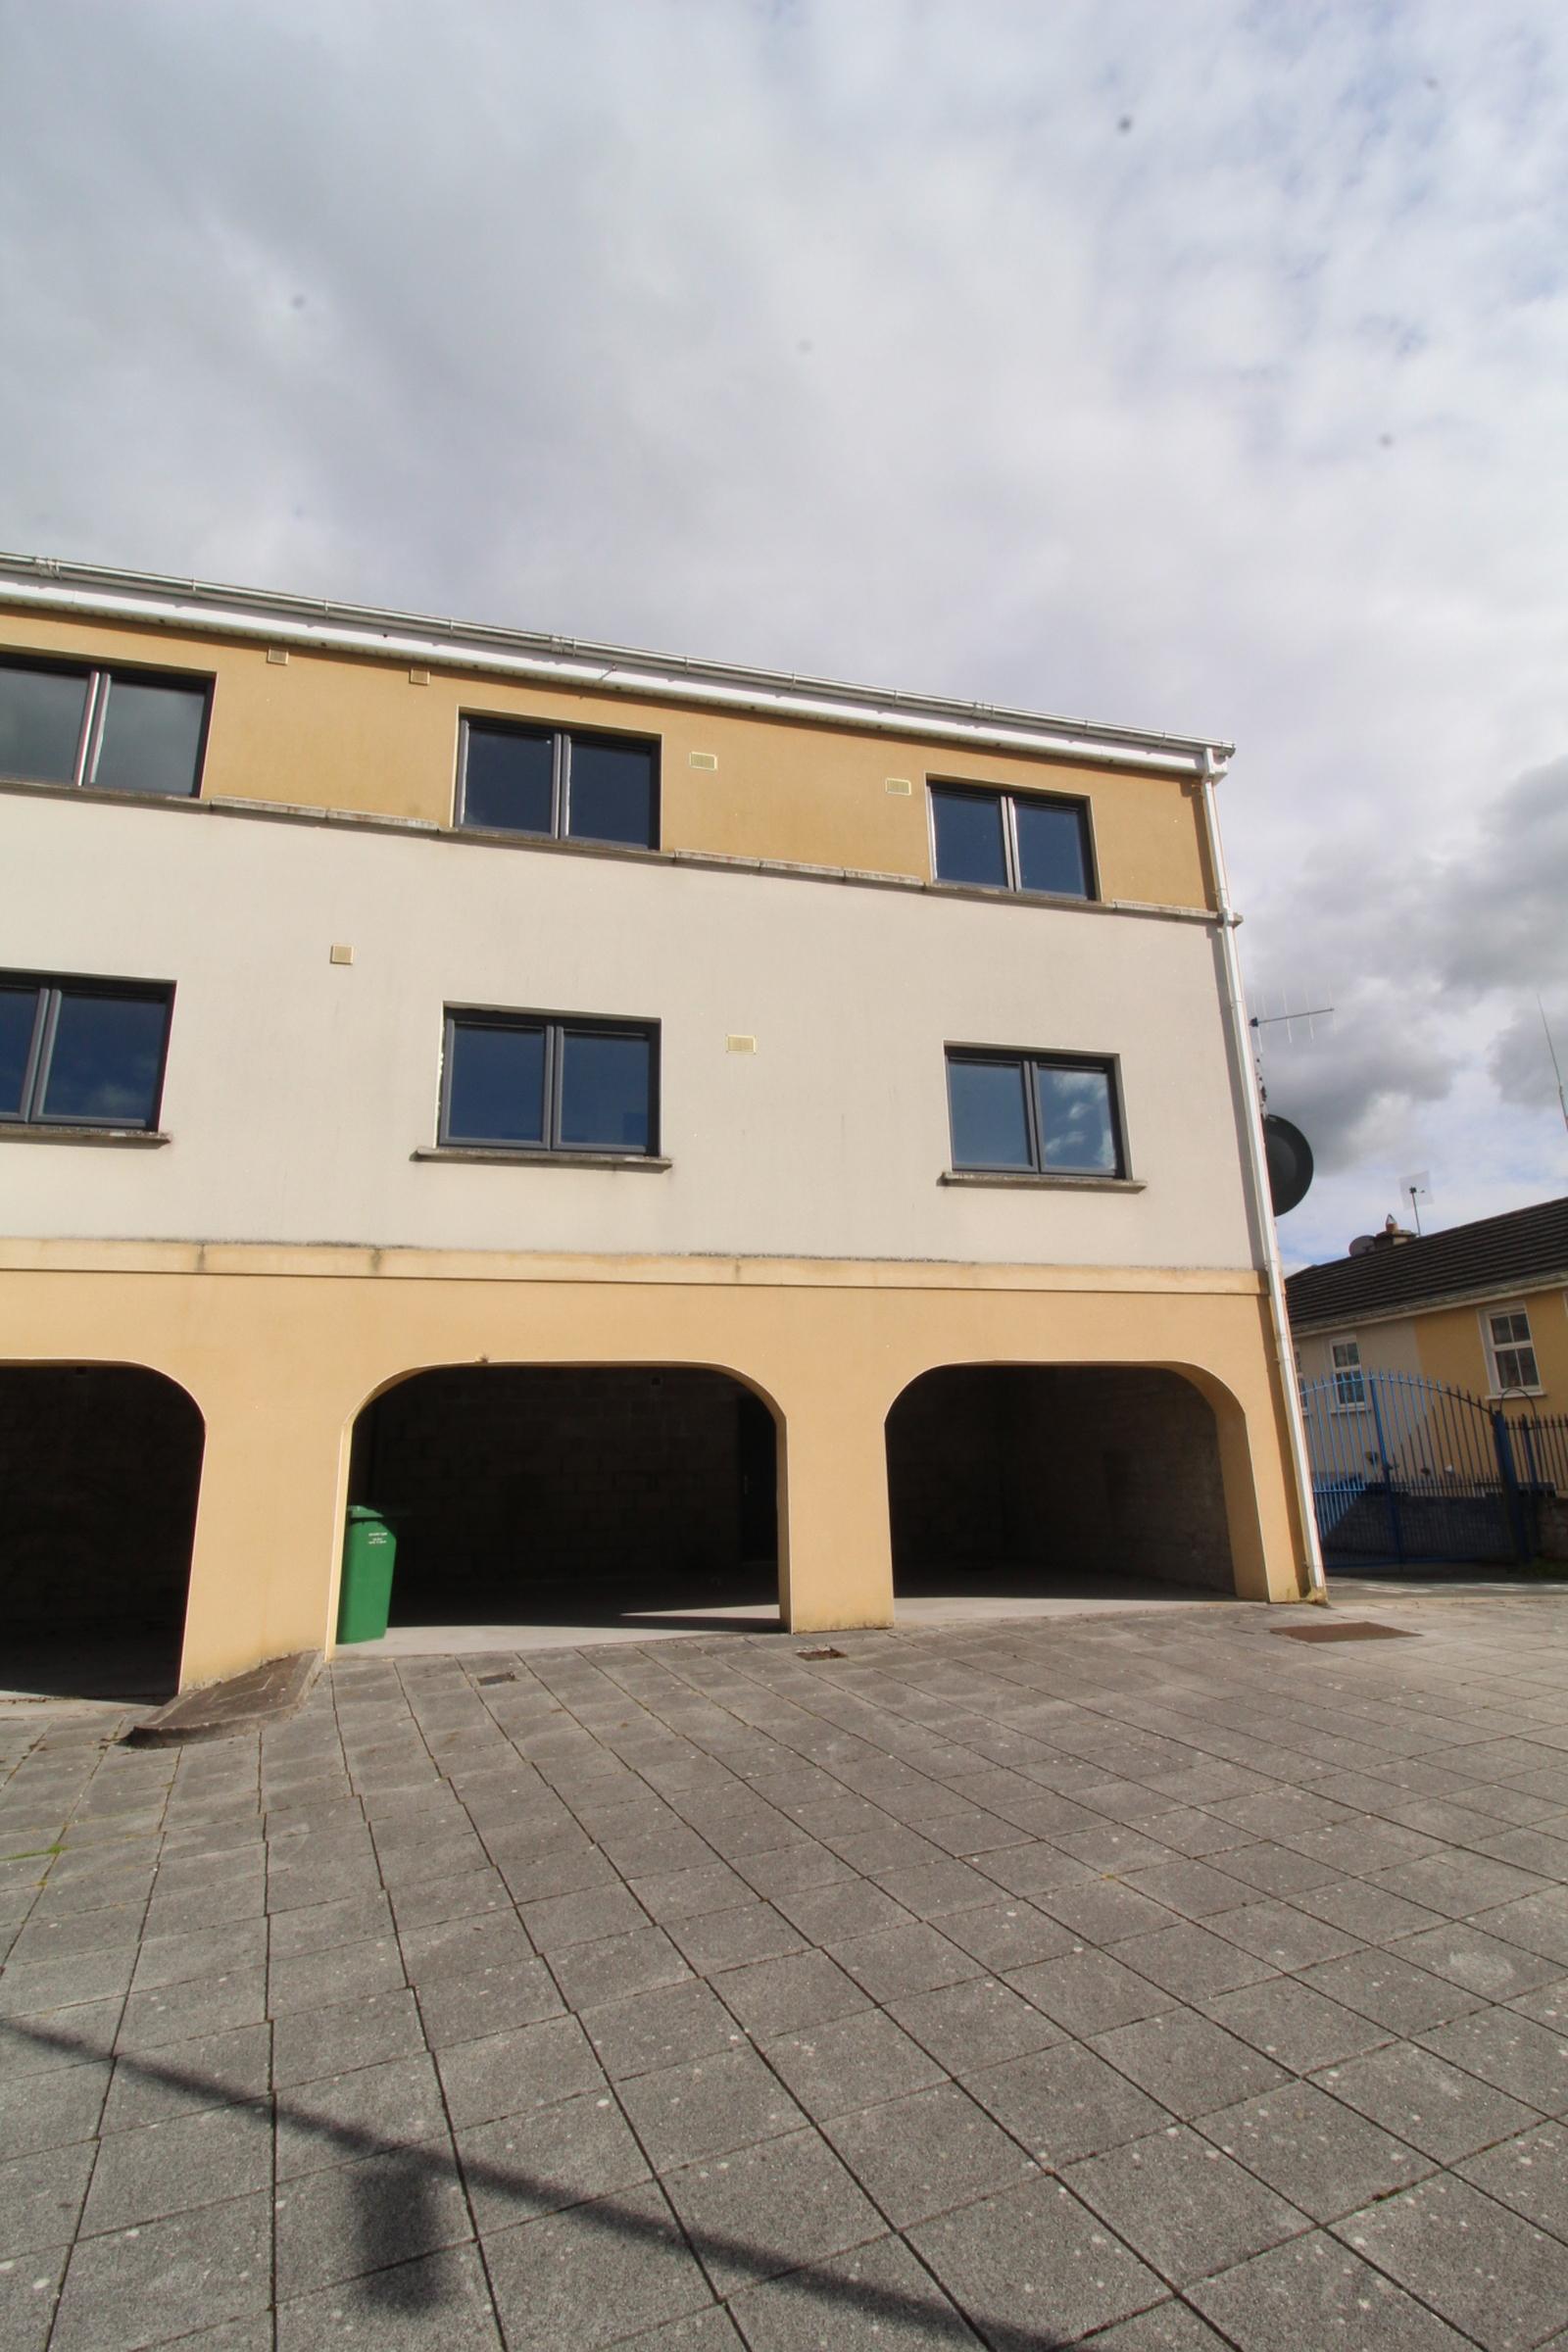 1 Plaza View, Fairgreen, Mallow, Co. Cork